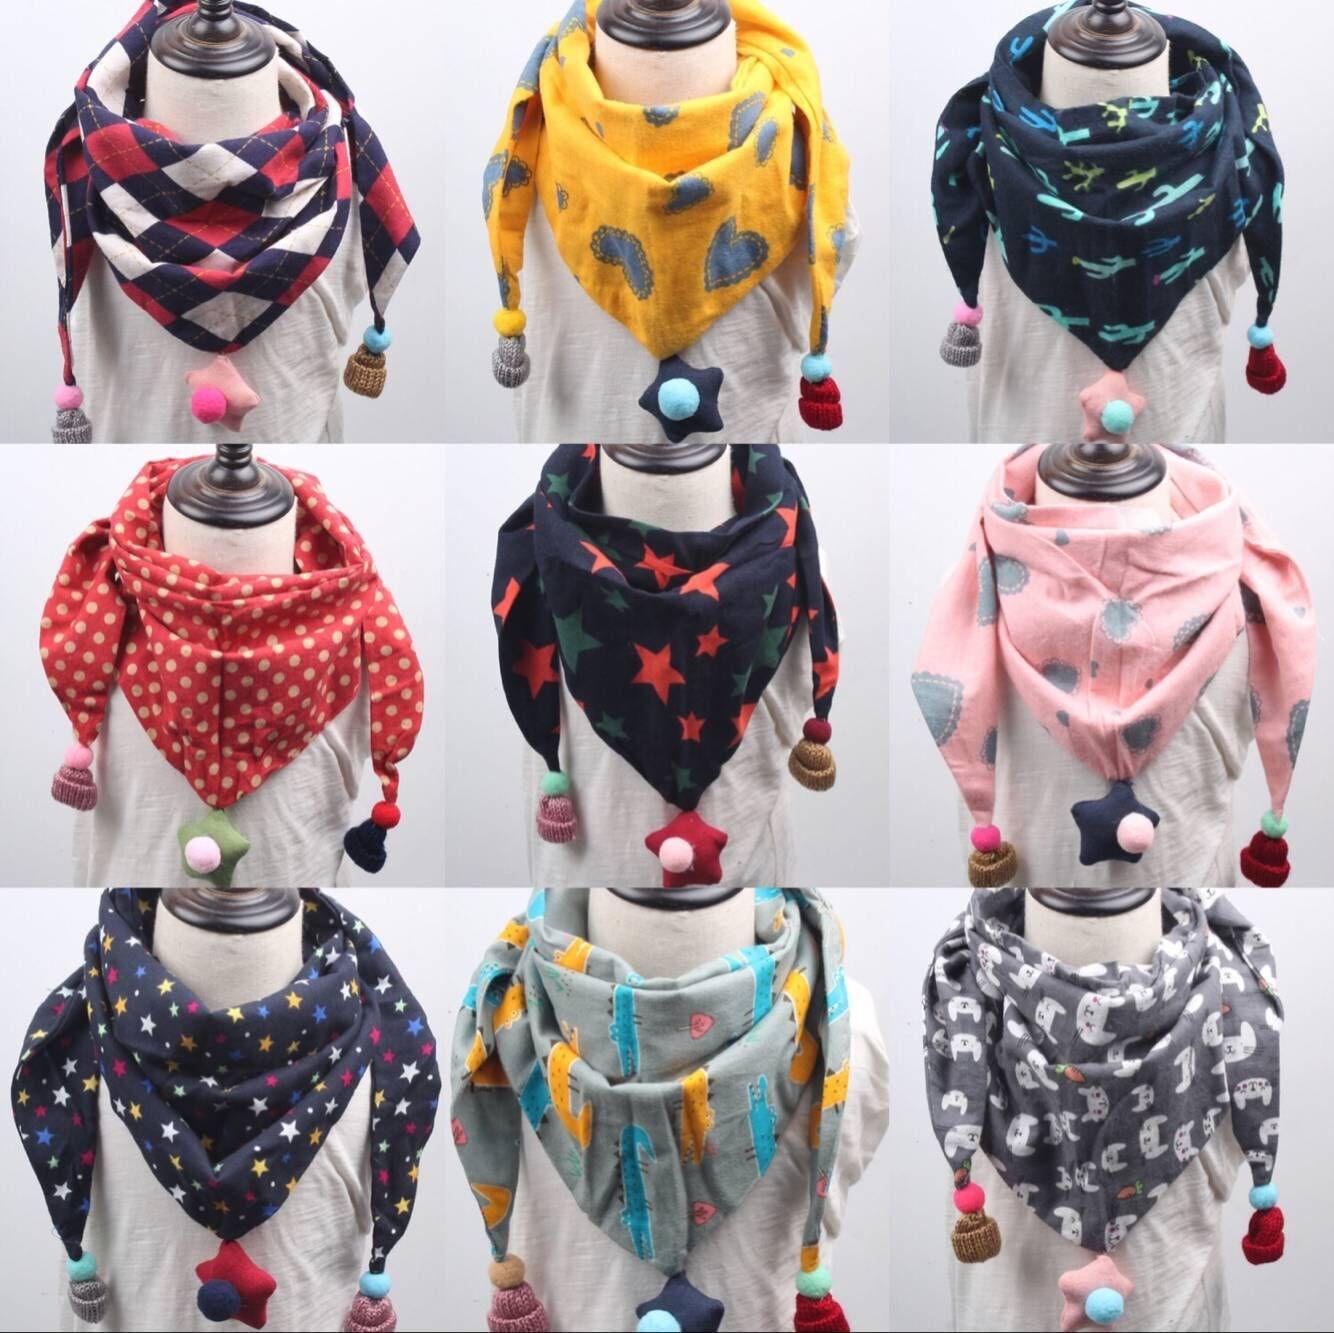 Scarf children boys and girls versatile baby triangle scarf cute baby warm neck